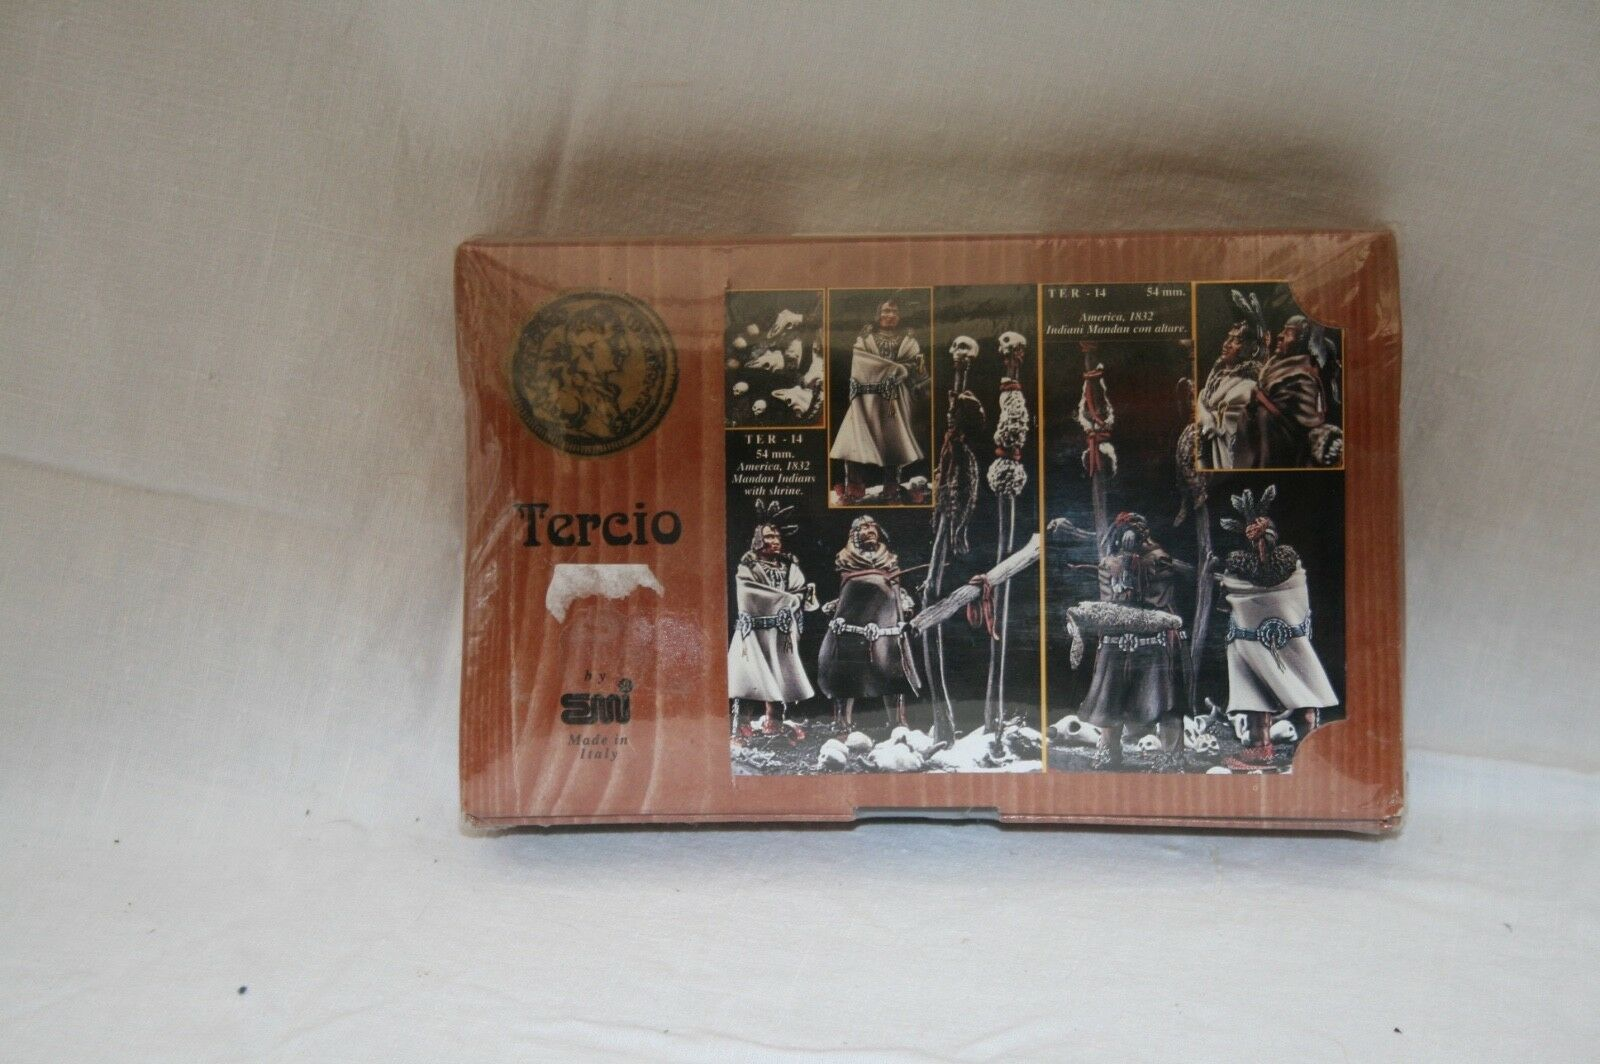 Tercio ter - 14 54mm America, 1832 Mandan Indians with Shrine